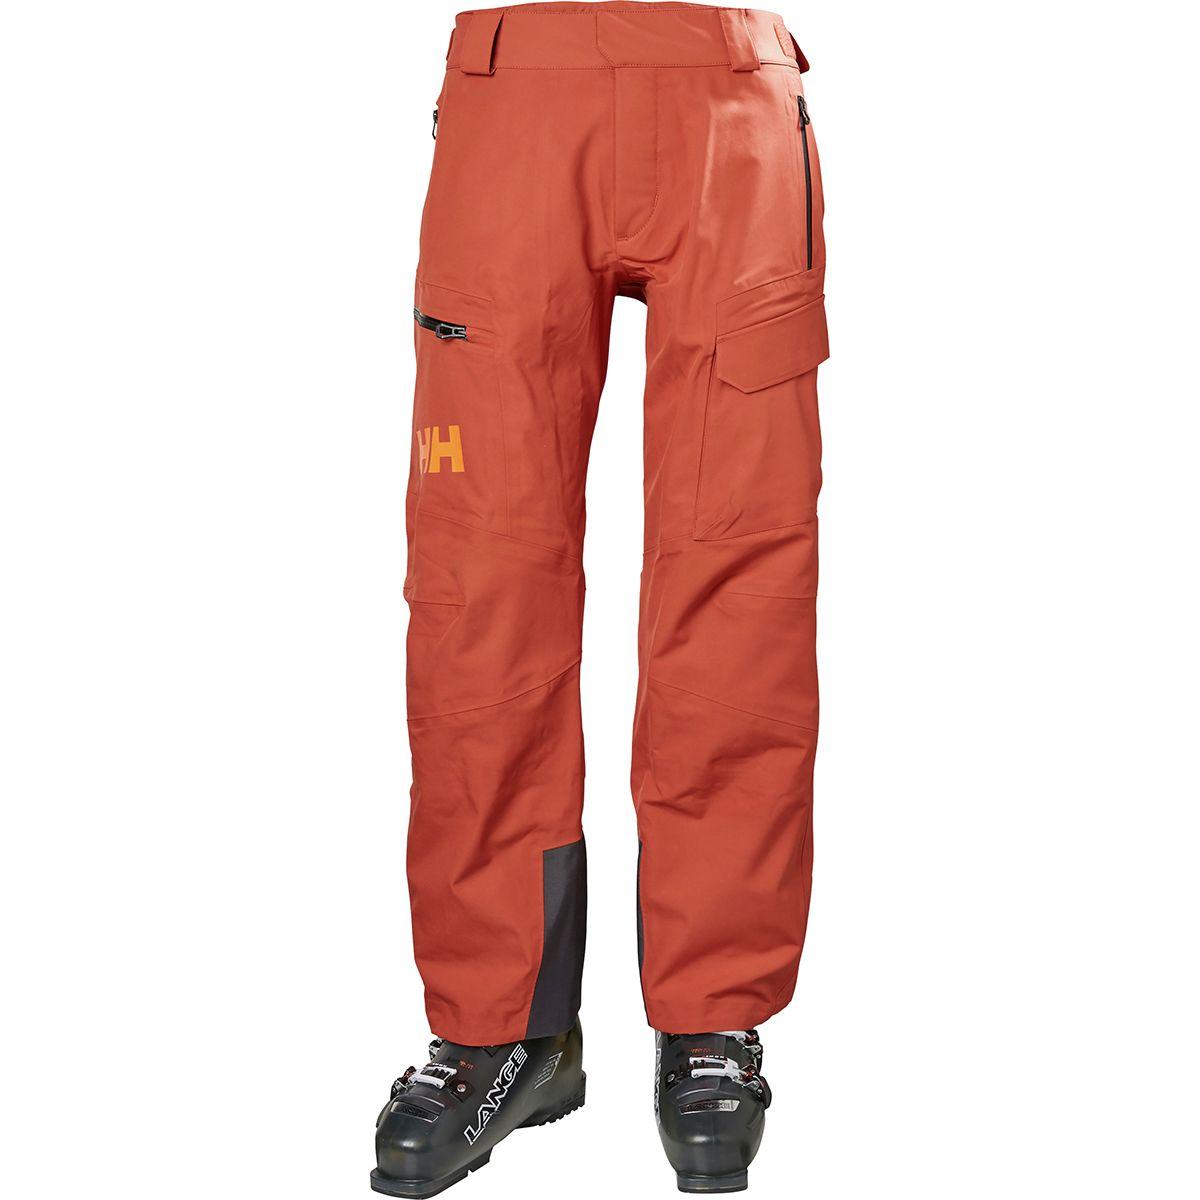 Helly Hansen Ridge Shell Pant